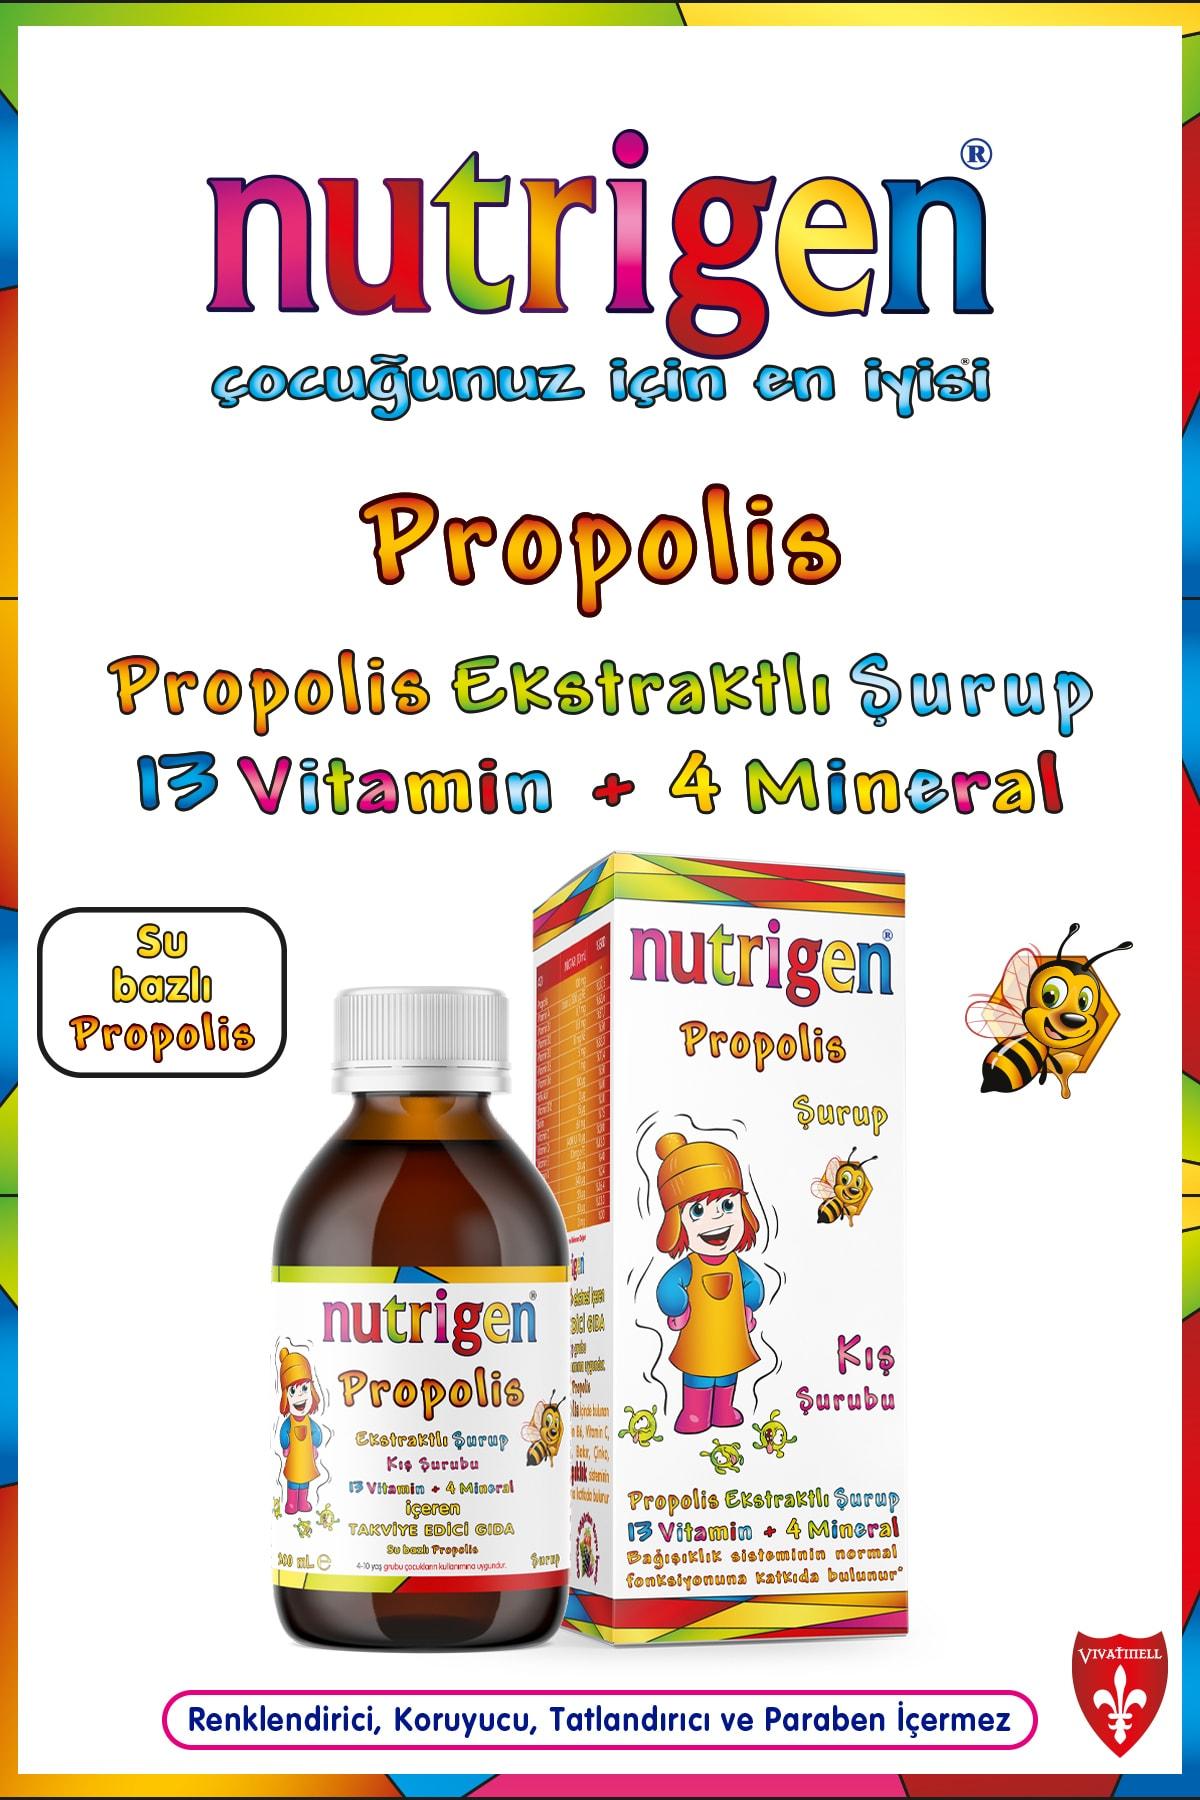 Nutrigen Propolis Şurup 200 ml*2 (2'li Fırsat Paketi) 2